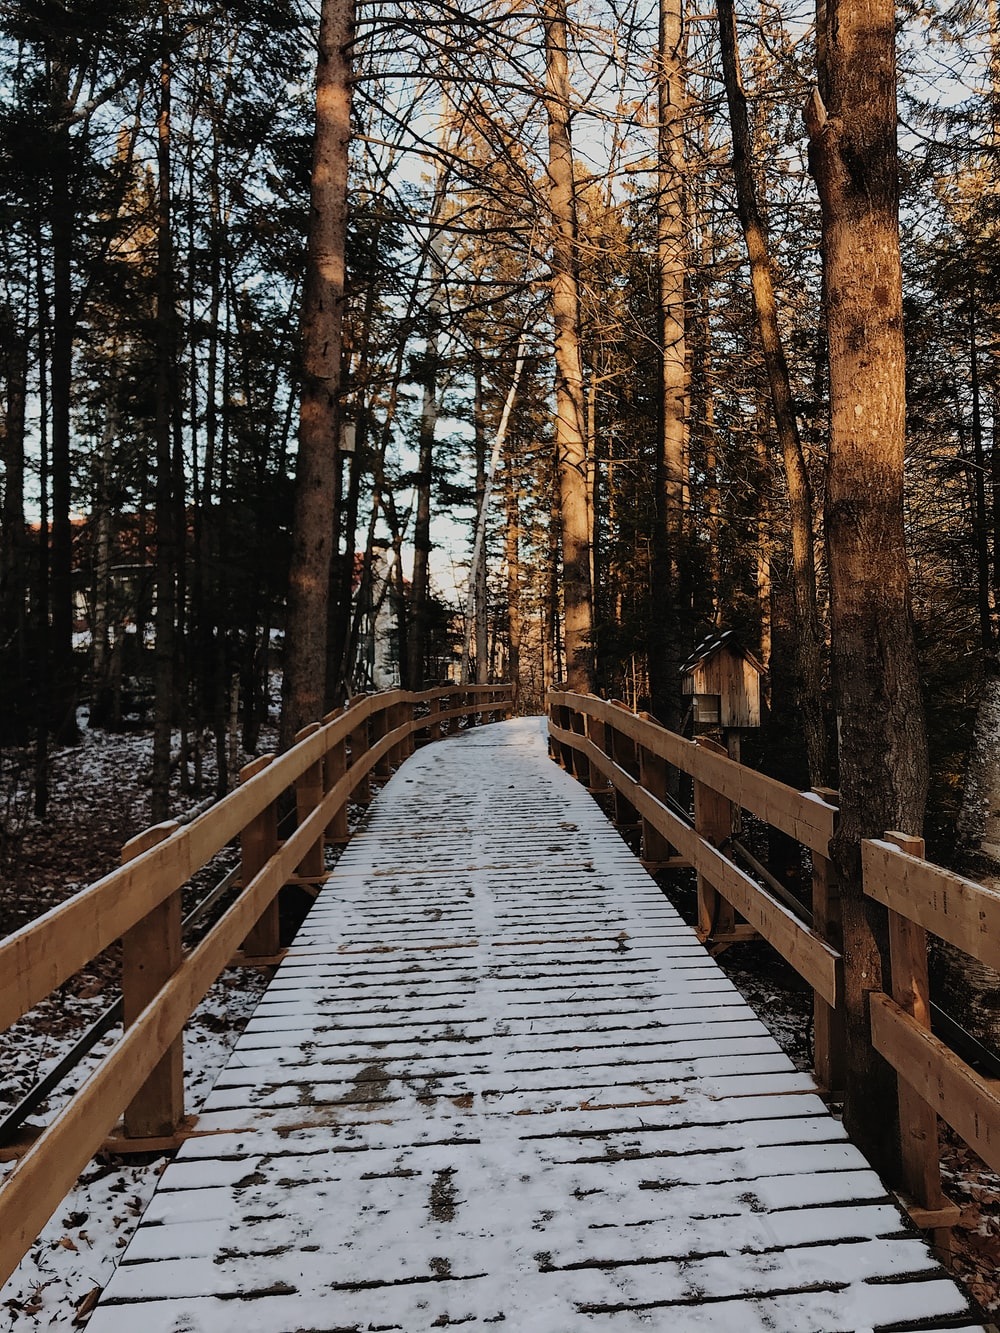 snow covered brown wooden bridge between trees